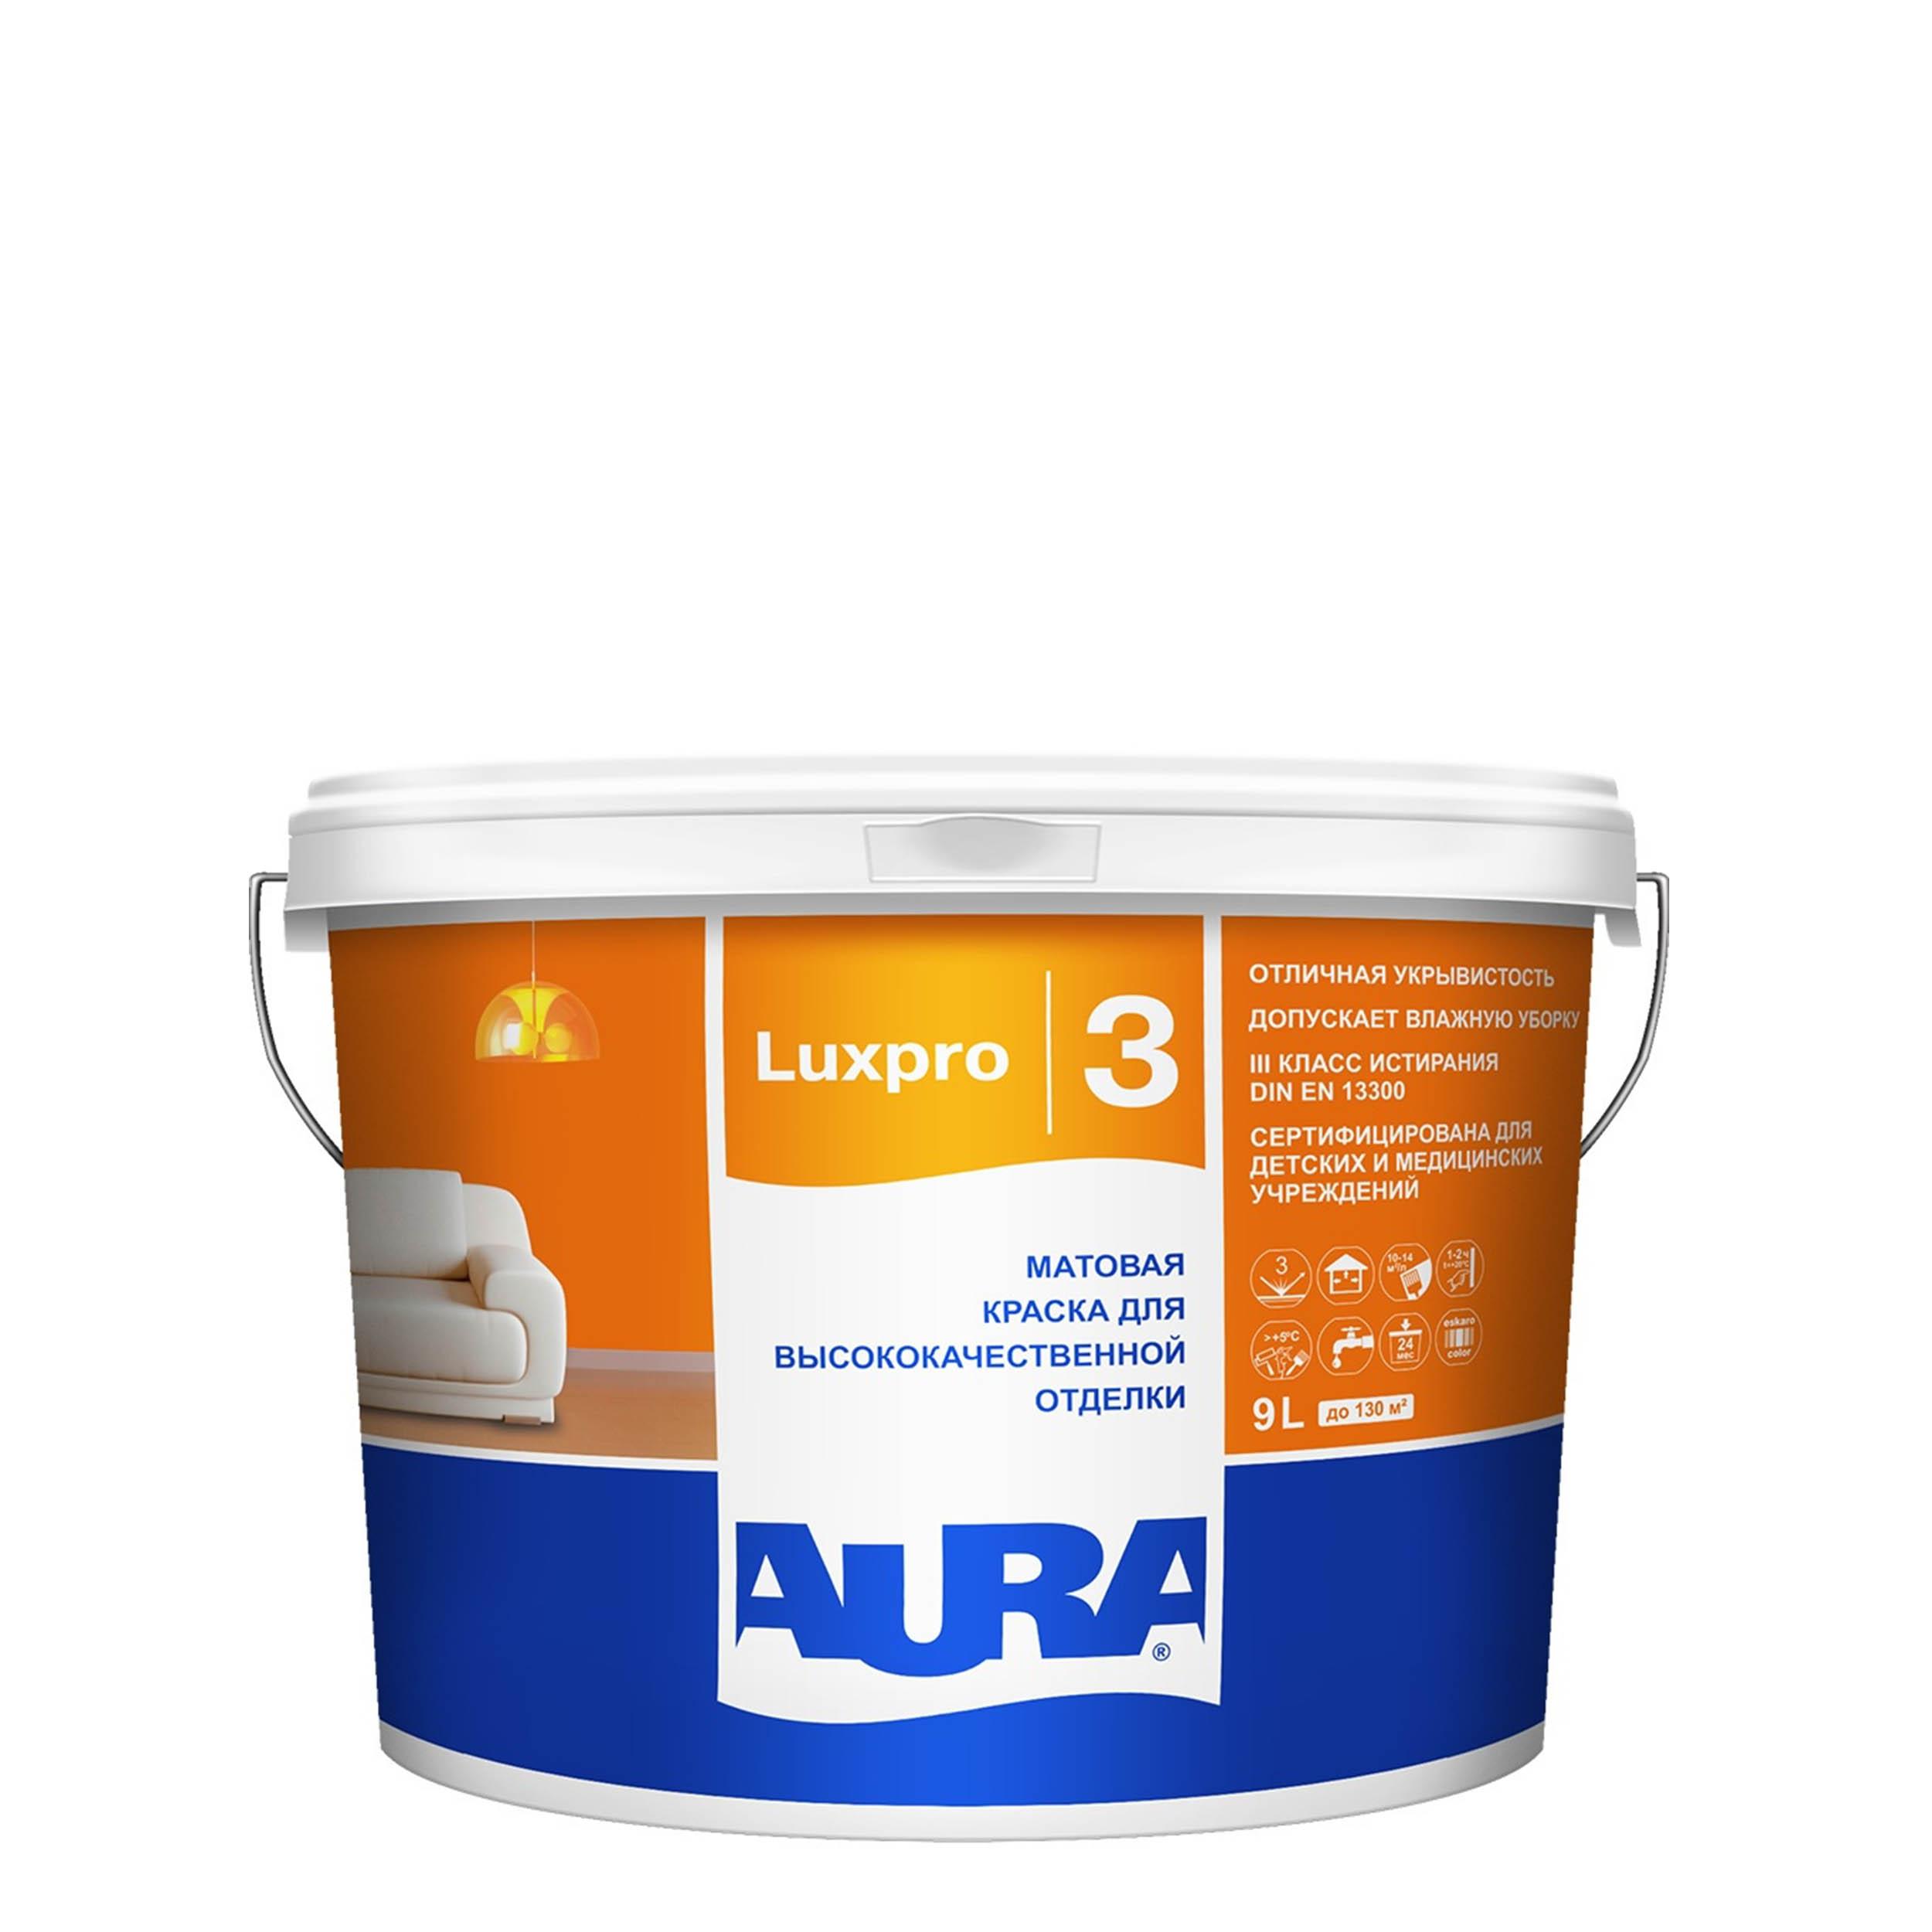 Фото 4 - Краска интерьерная, Aura LuxPRO 3, RAL 6018, 11 кг.